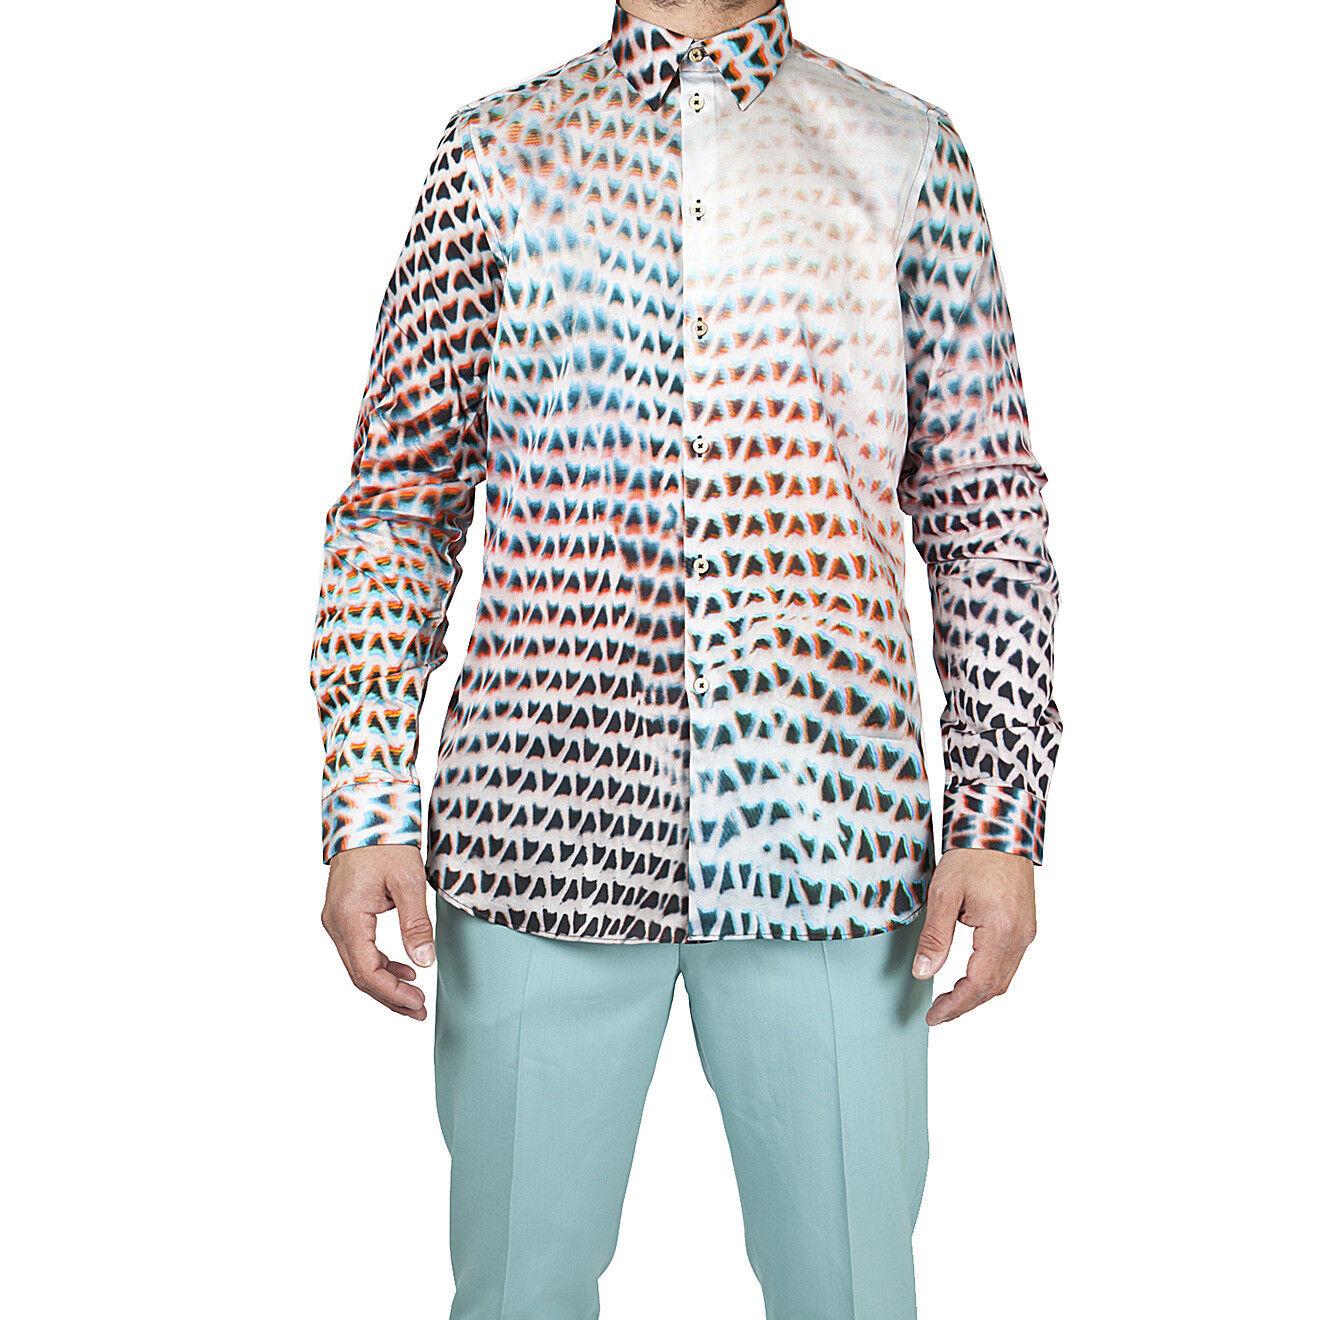 Paul Smith camicia sfilata, catwalk print shirt